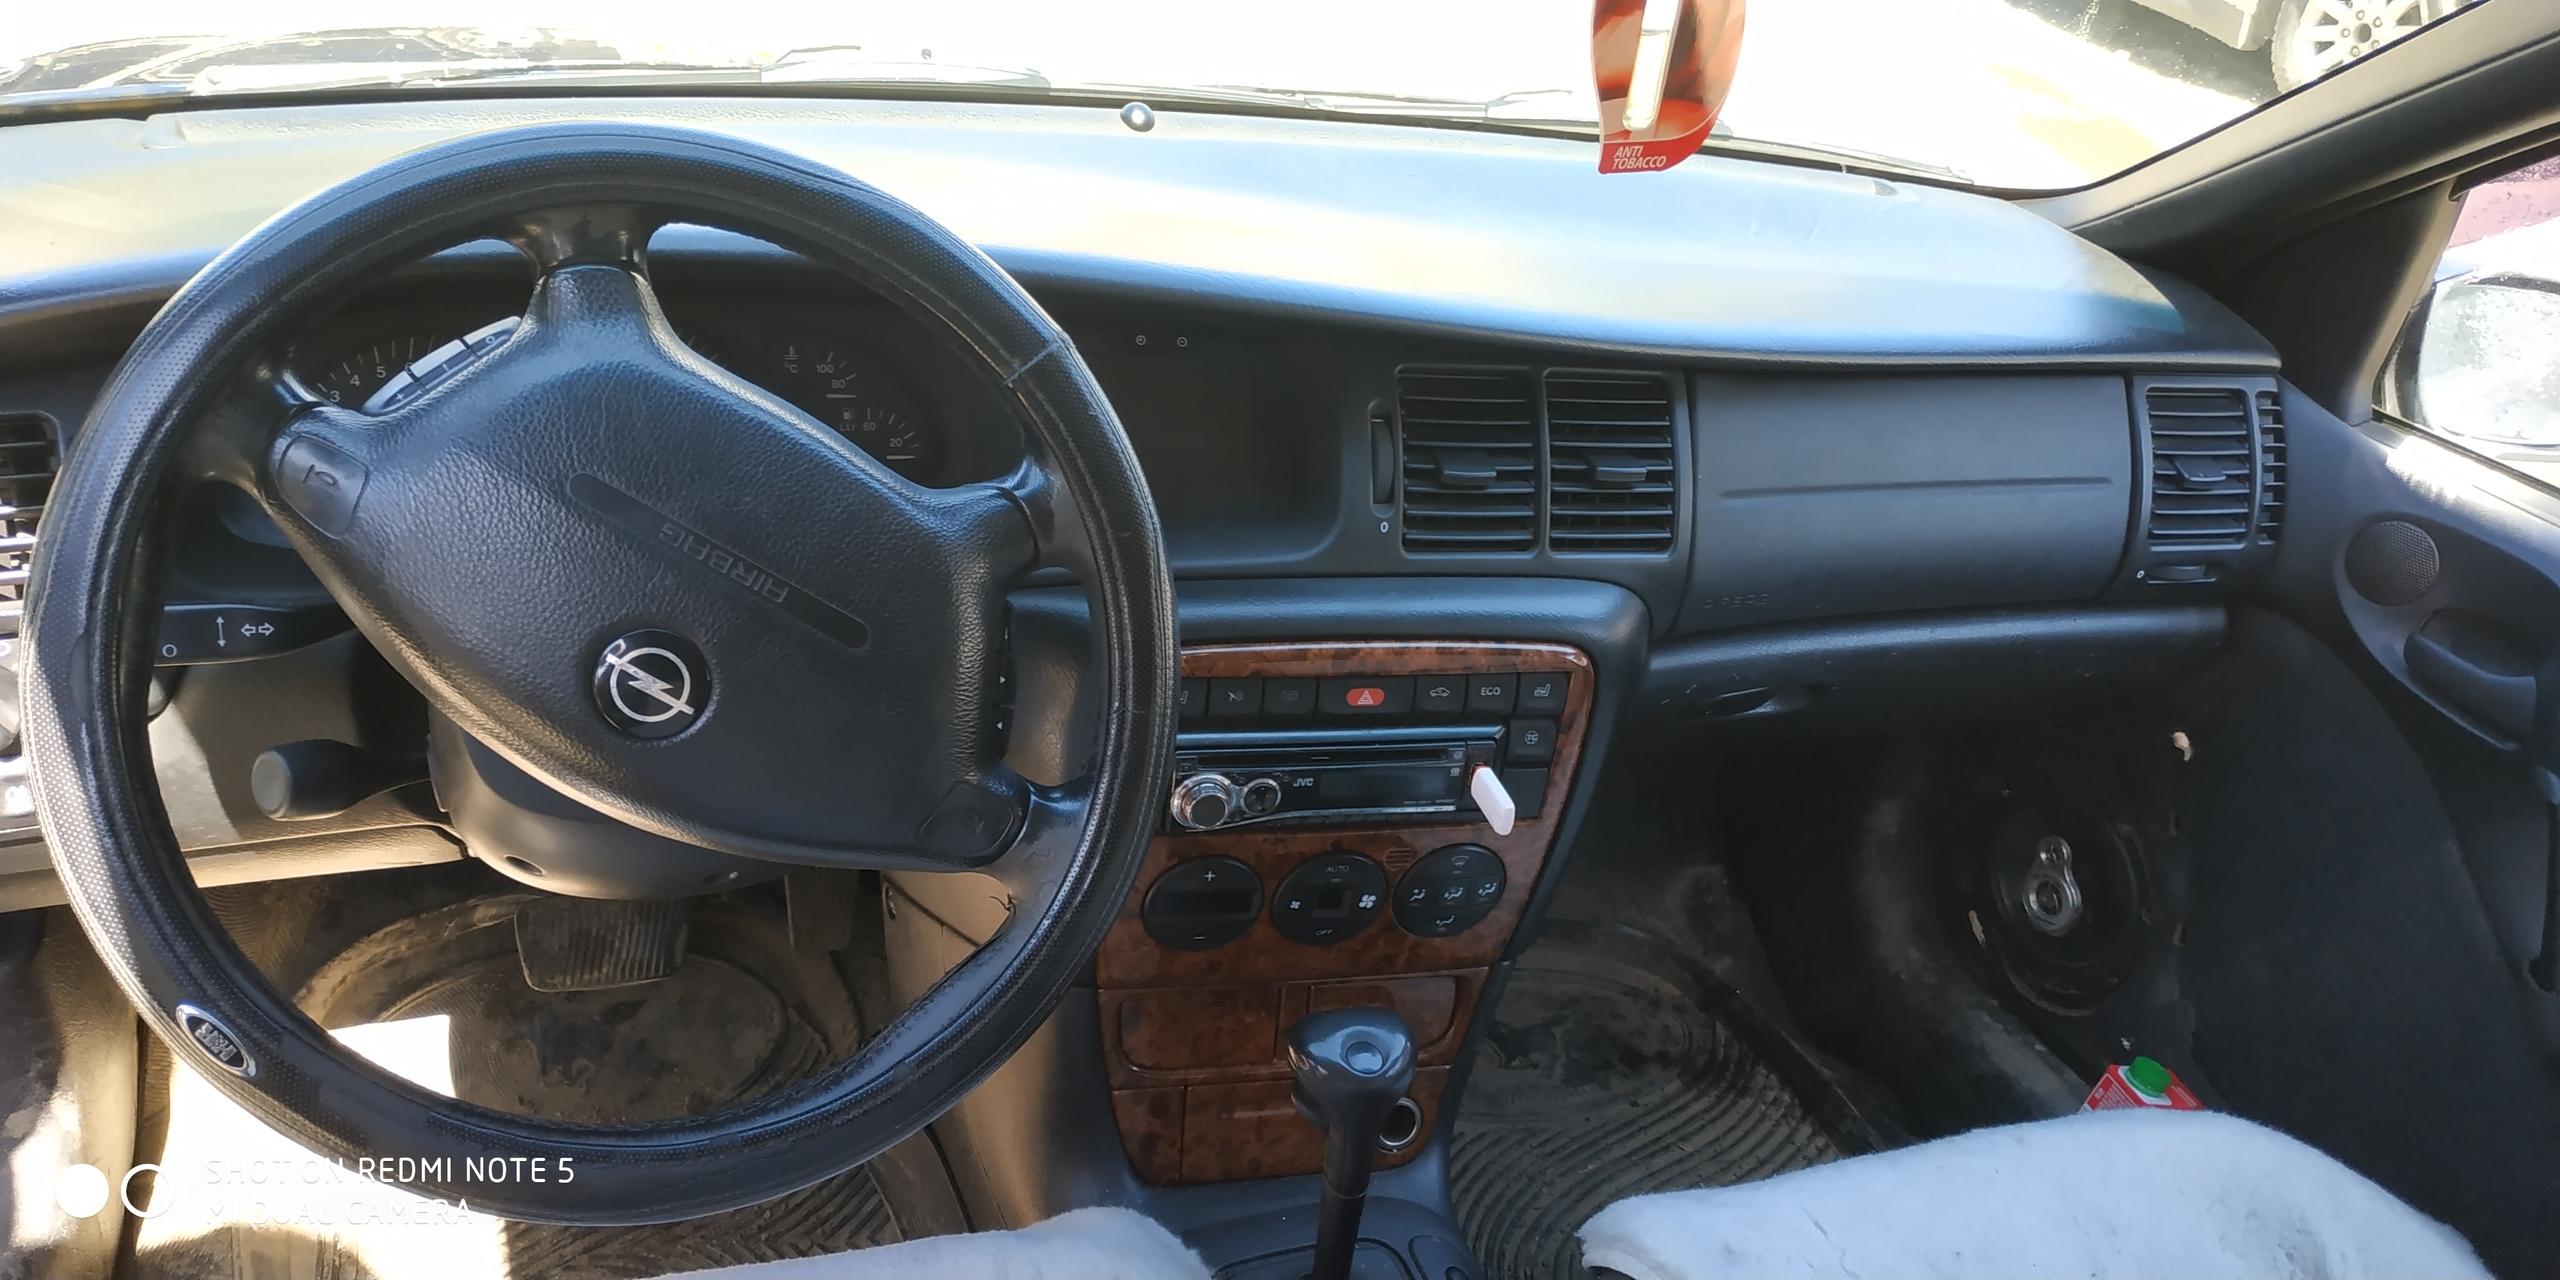 ОБМЕН НА ВАЗ. Очень редкий Opel, мотор V6 | Объявления Орска и Новотроицка №4714